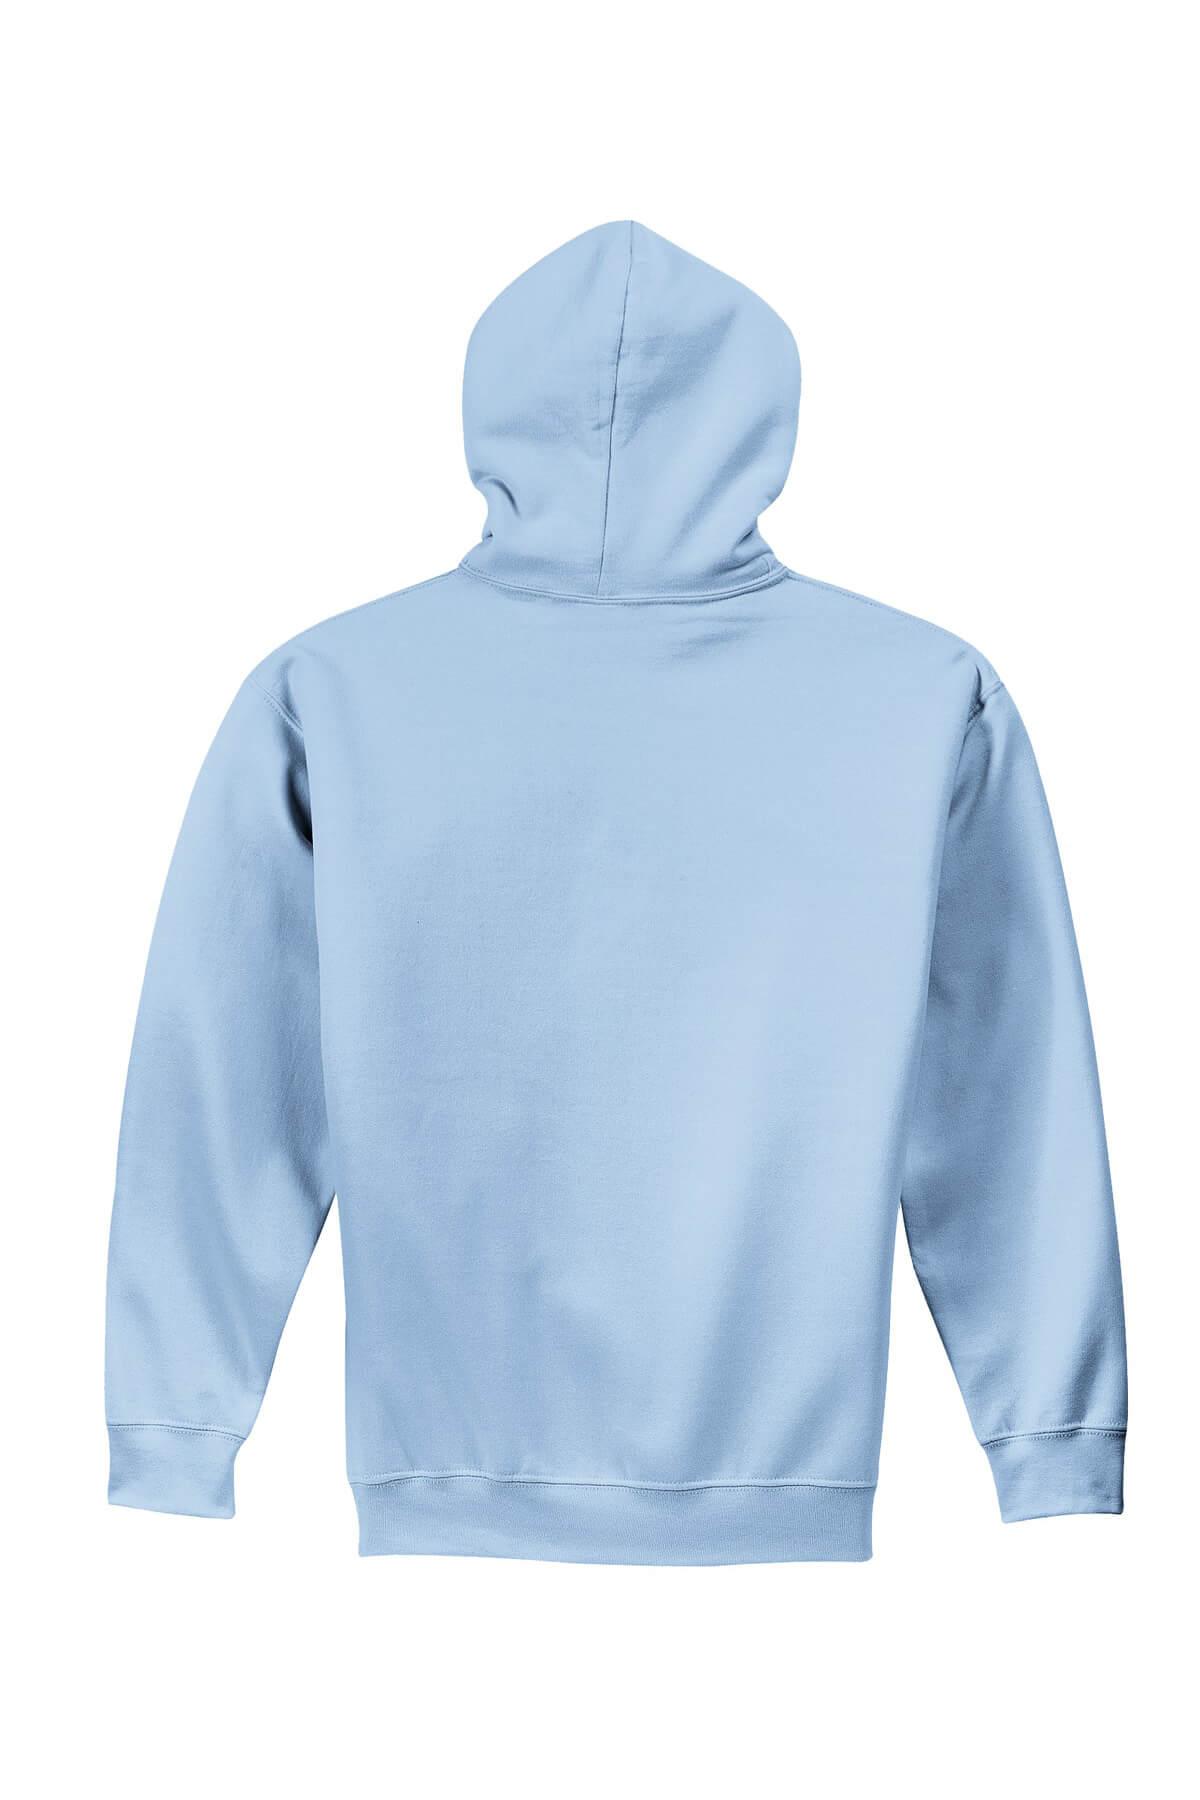 18500-light-blue-6